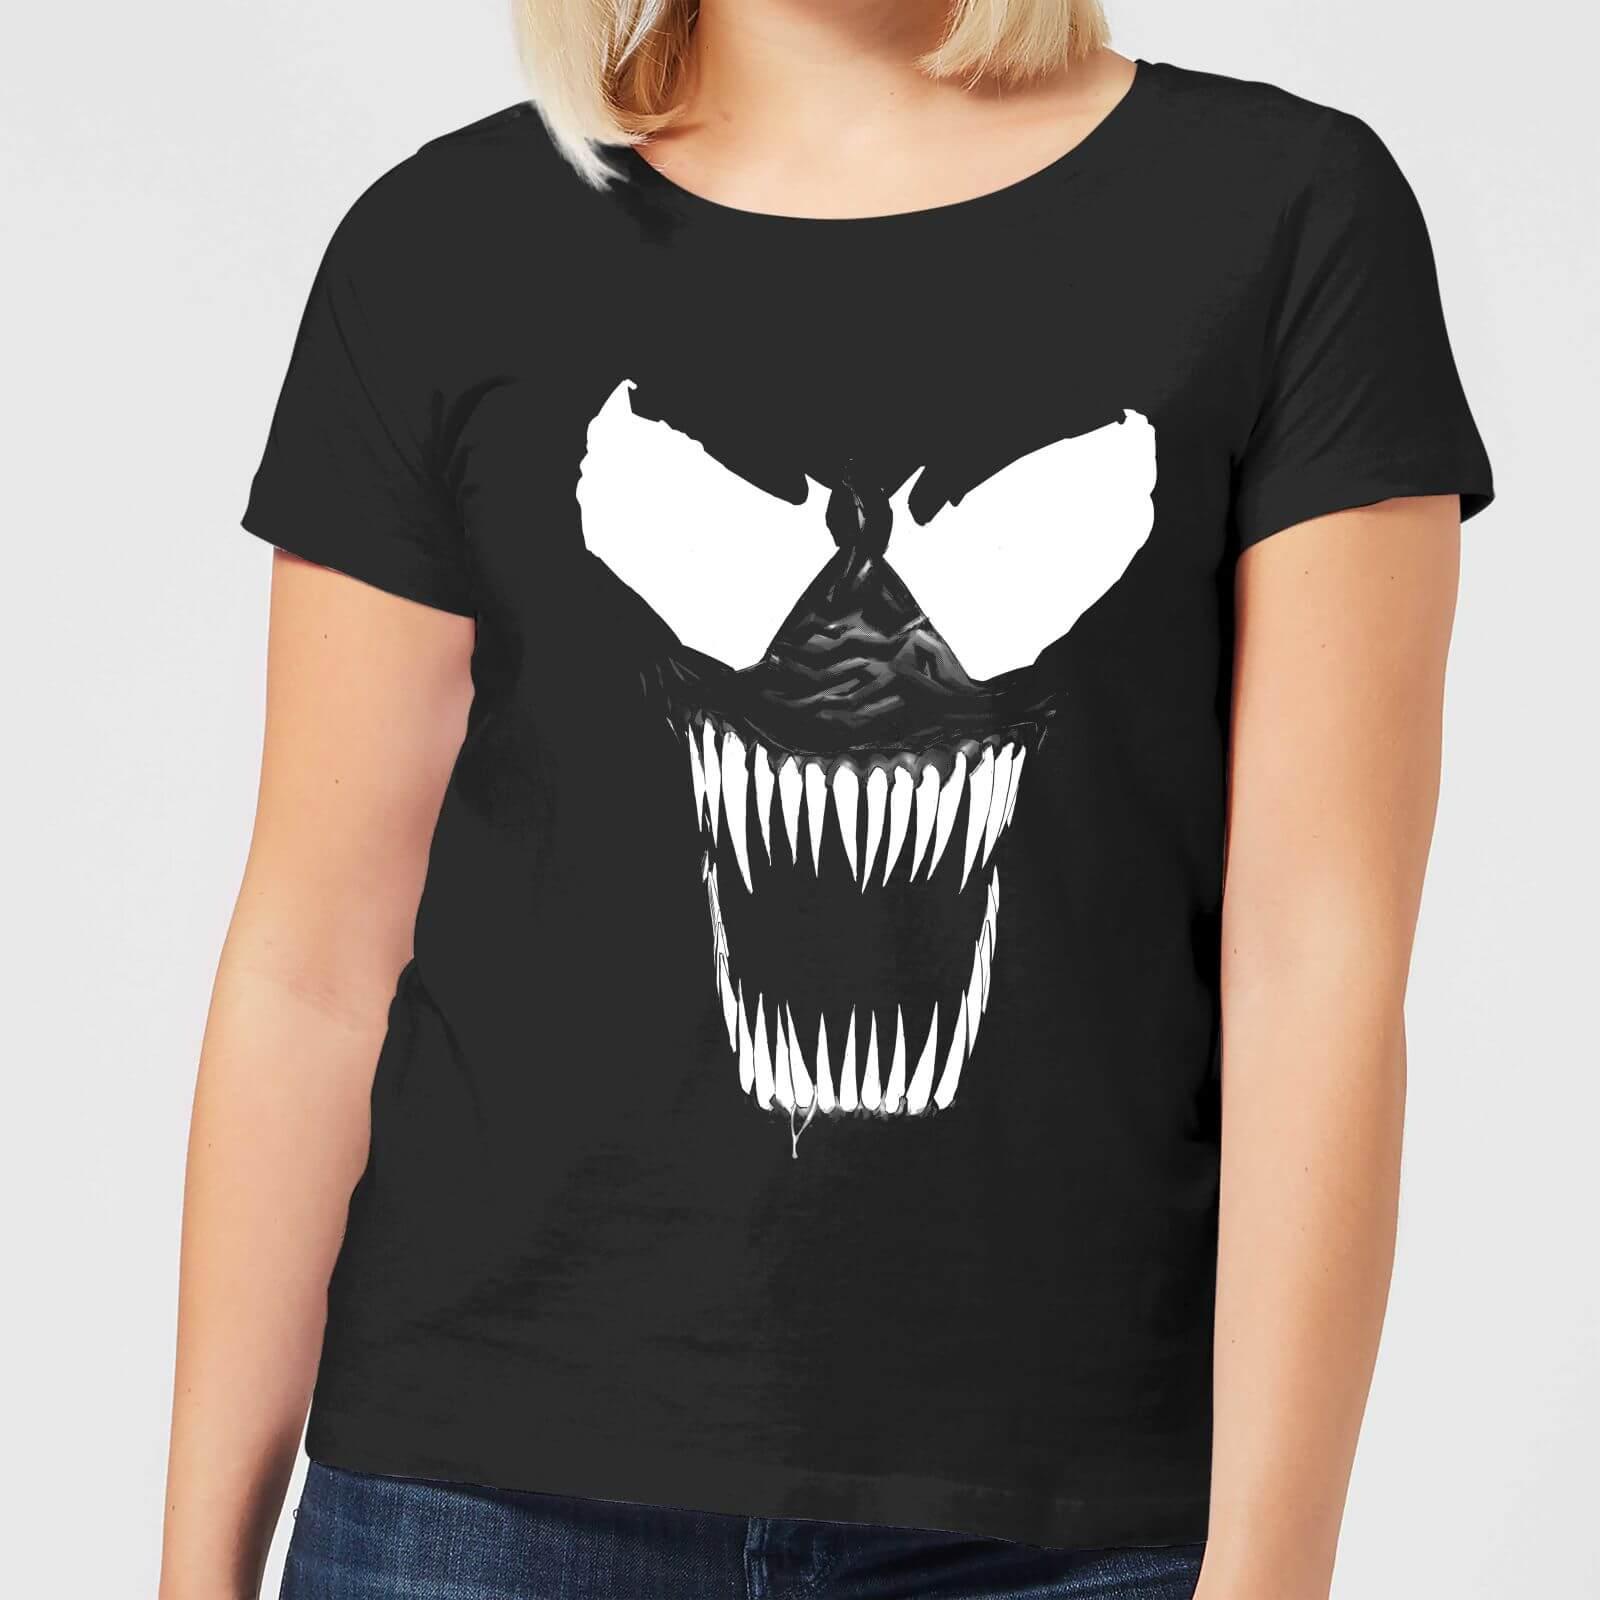 Marvel Venom Bare Teeth Women's T-Shirt - Black - 5XL - Black